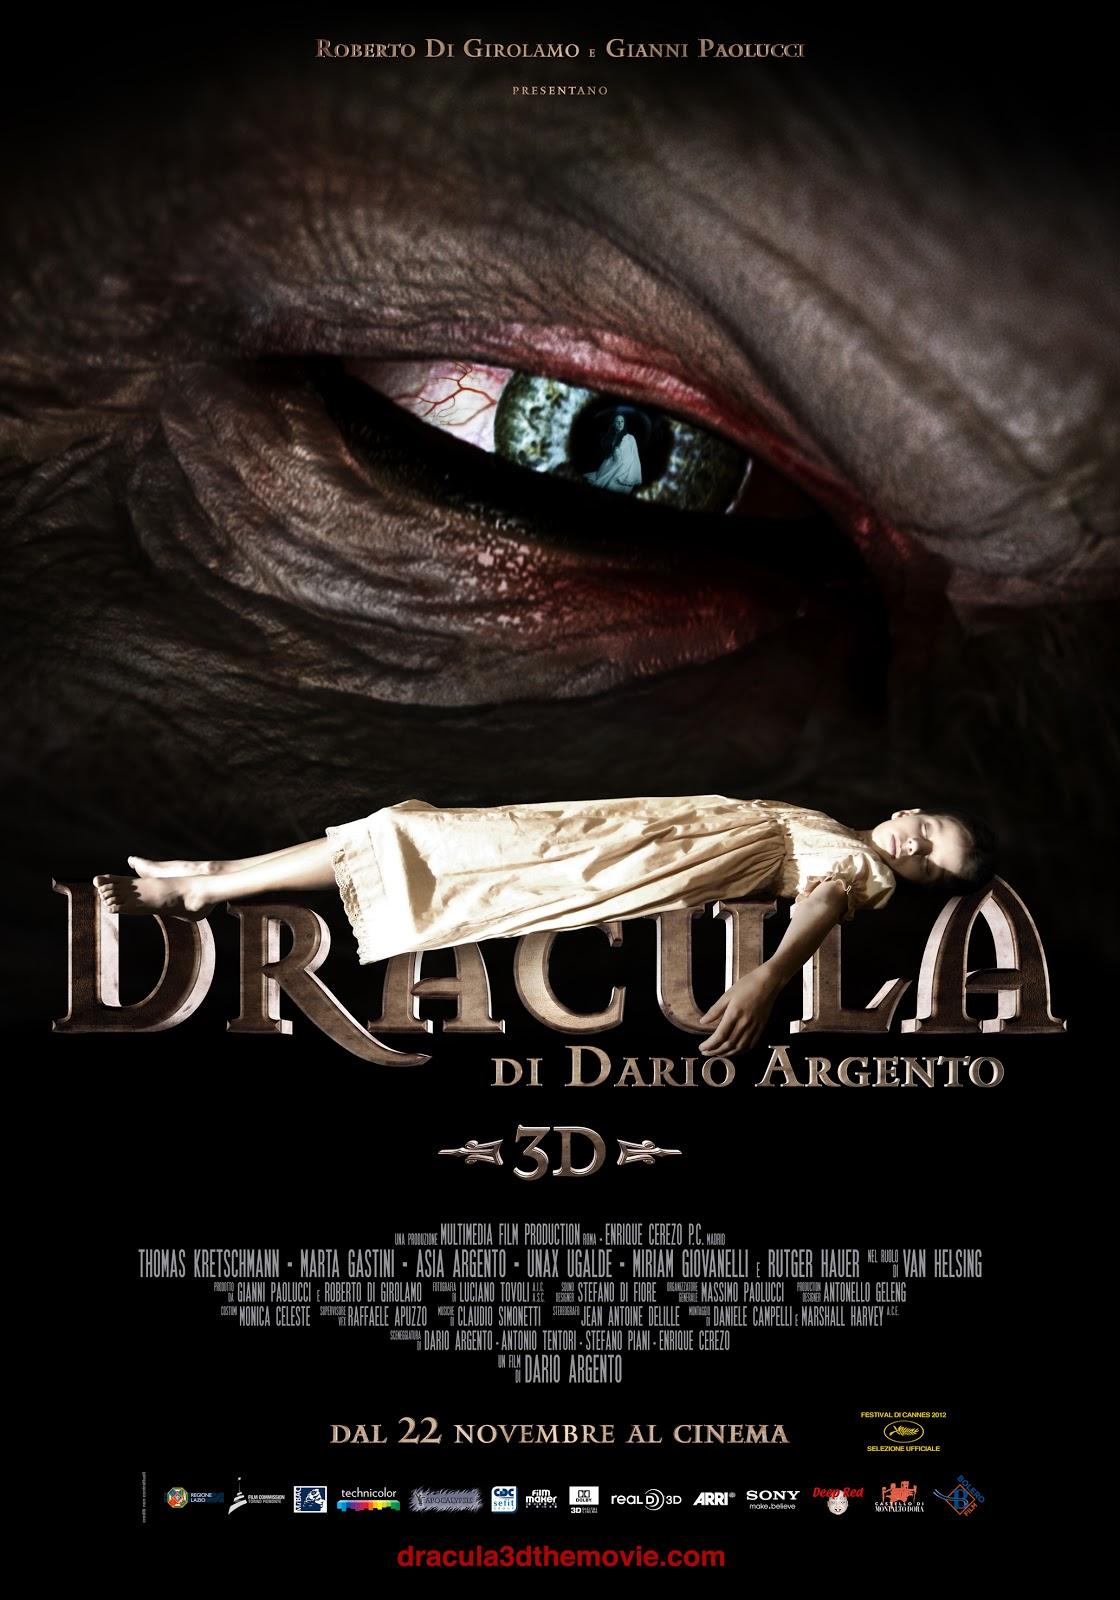 http://3.bp.blogspot.com/-hCoIbCZXvGs/UWR4BUtBl_I/AAAAAAAAKVU/xSlXG90Zyn8/s1600/dracula-3d-poster-italia.jpg